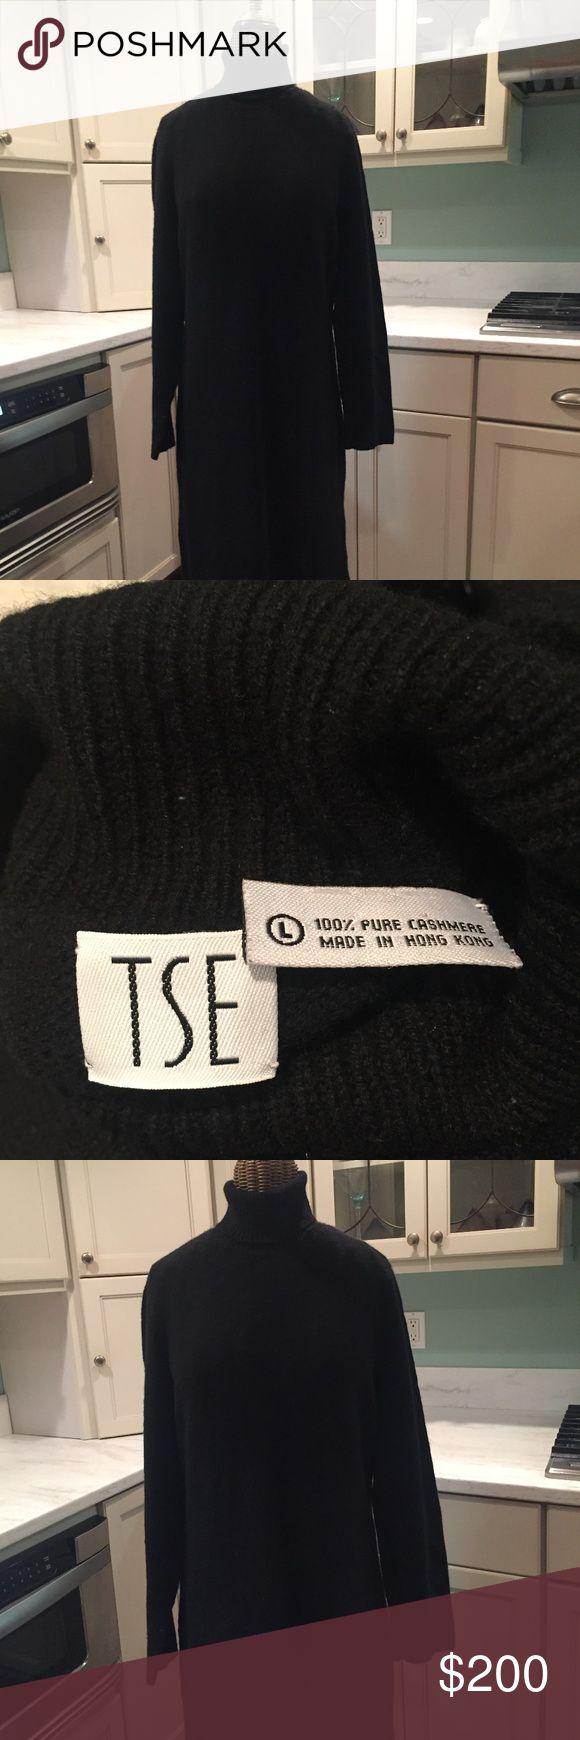 Black Turtleneck Cashmere  Dress TSE  Black Turtleneck Cashmere Dress 100% Pure Cashmere Size Large TSE Dresses Long Sleeve